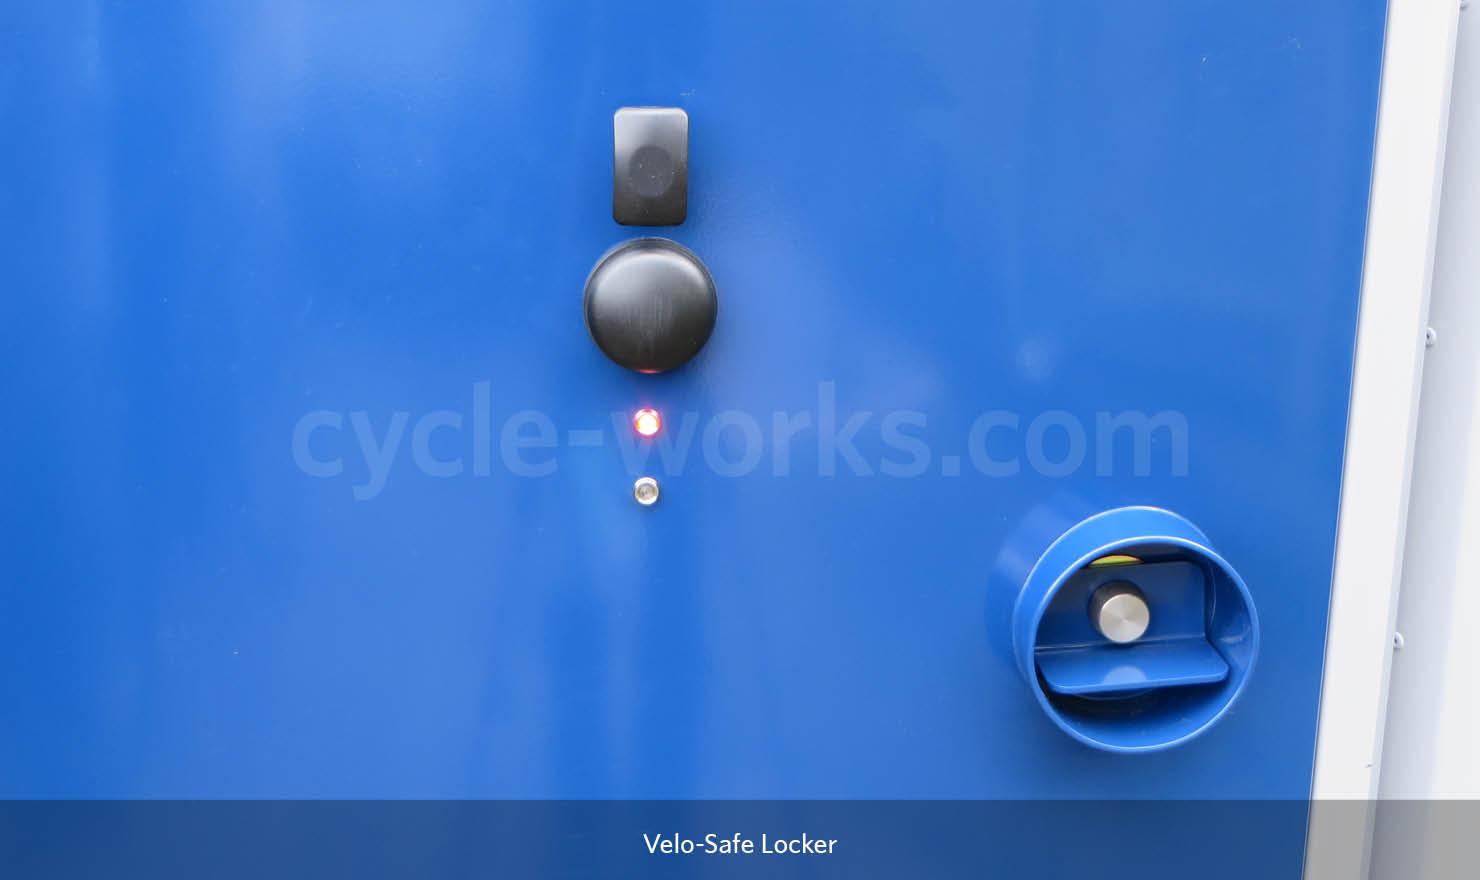 Electronic Access Bike Lockers